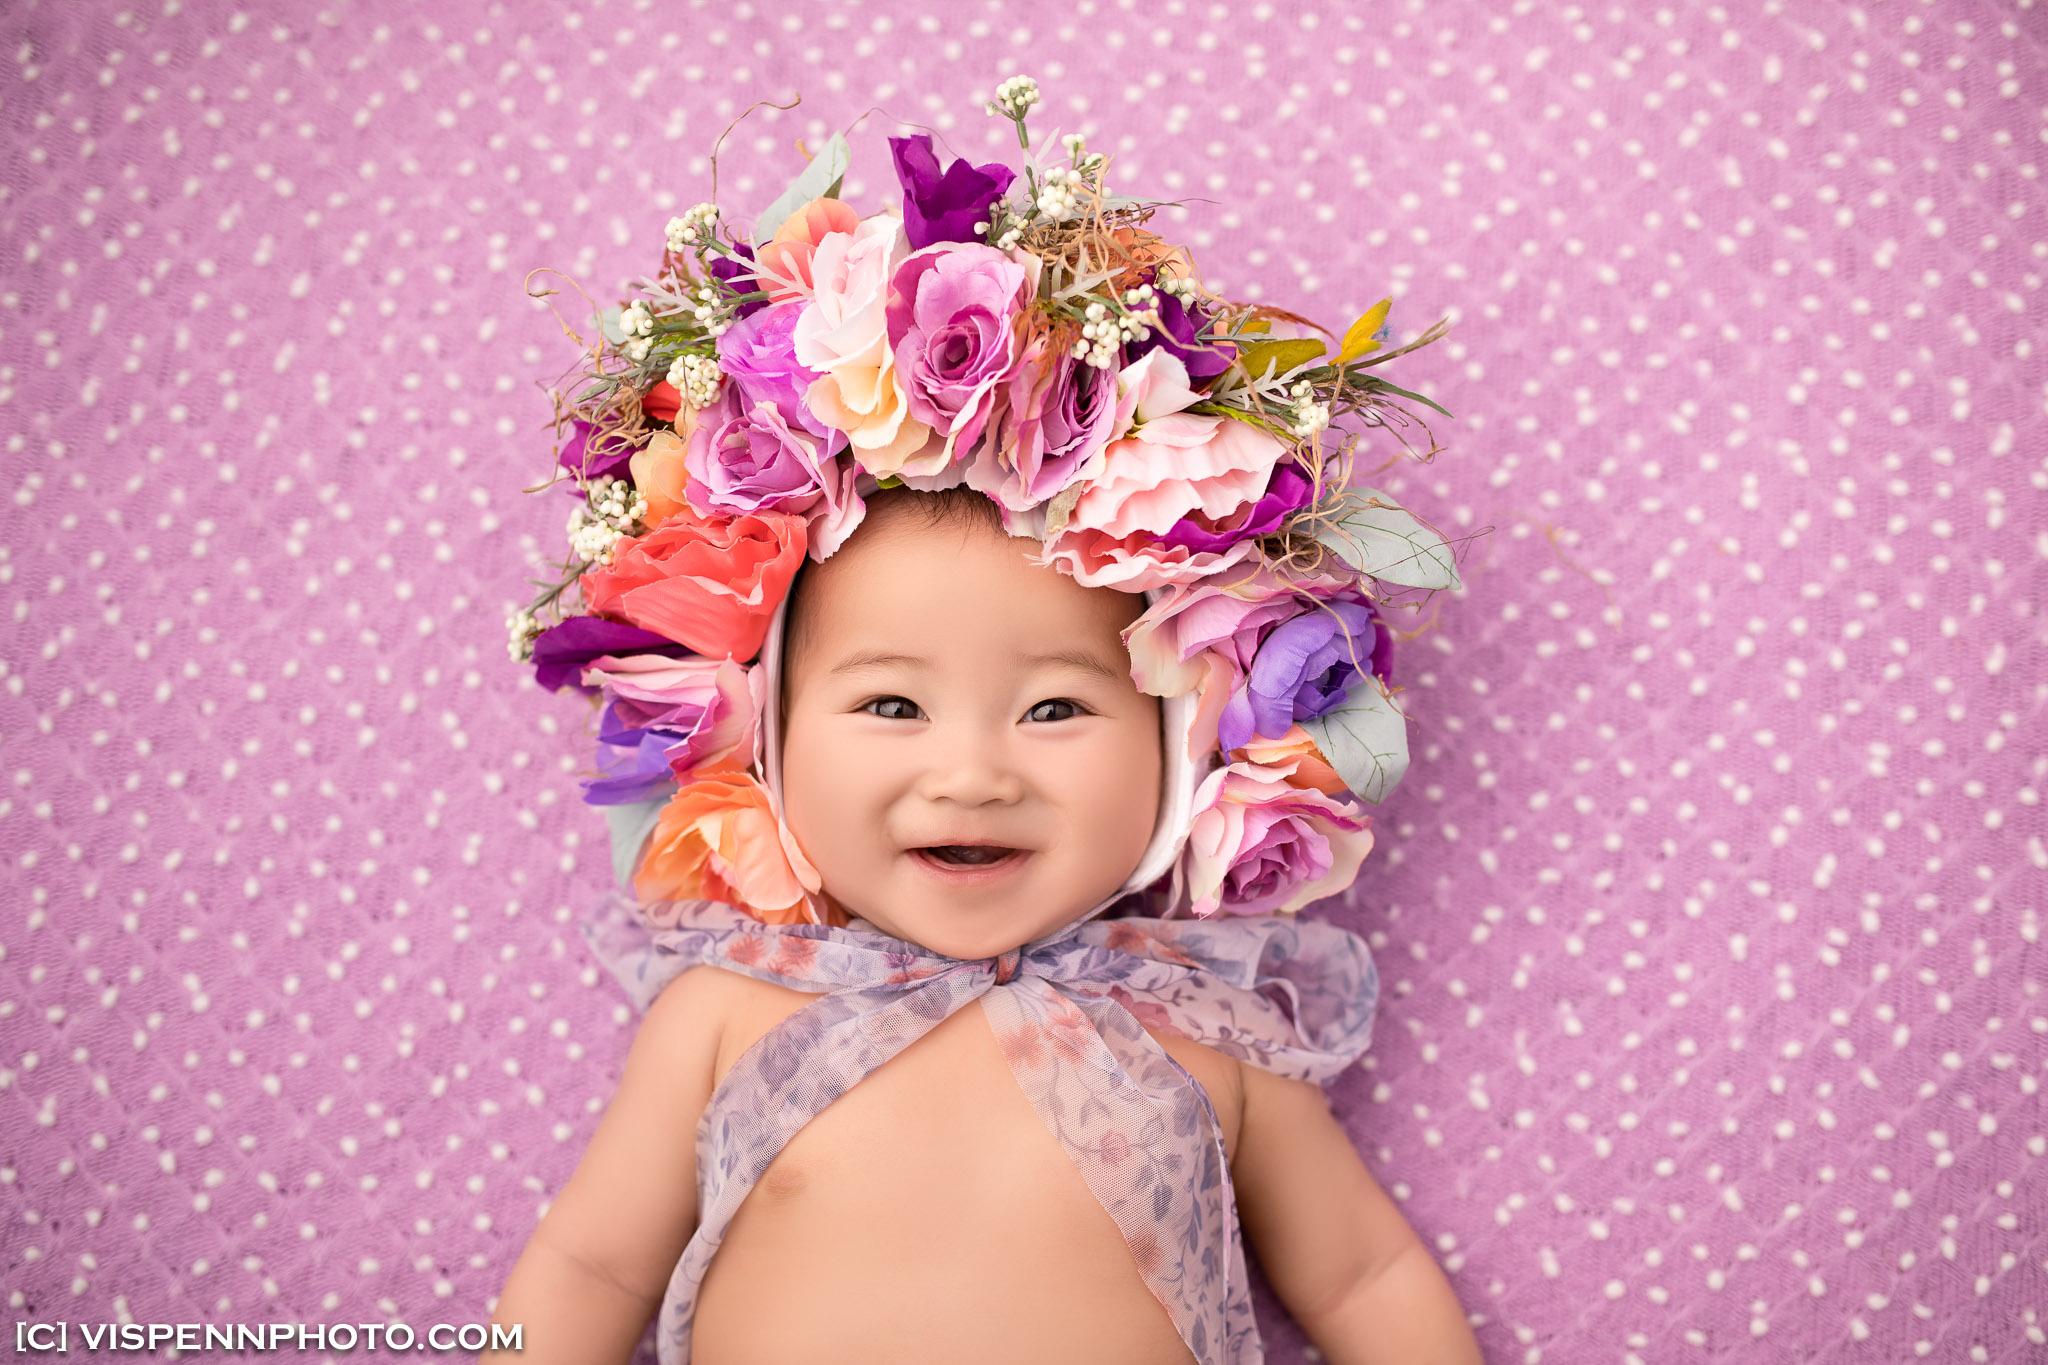 Melbourne Newborn Baby Family Photo BaoBao VISPENN 墨尔本 儿童 宝宝 百天照 满月照 孕妇照 全家福 100DAYS VISPENN ElaineWU 1321